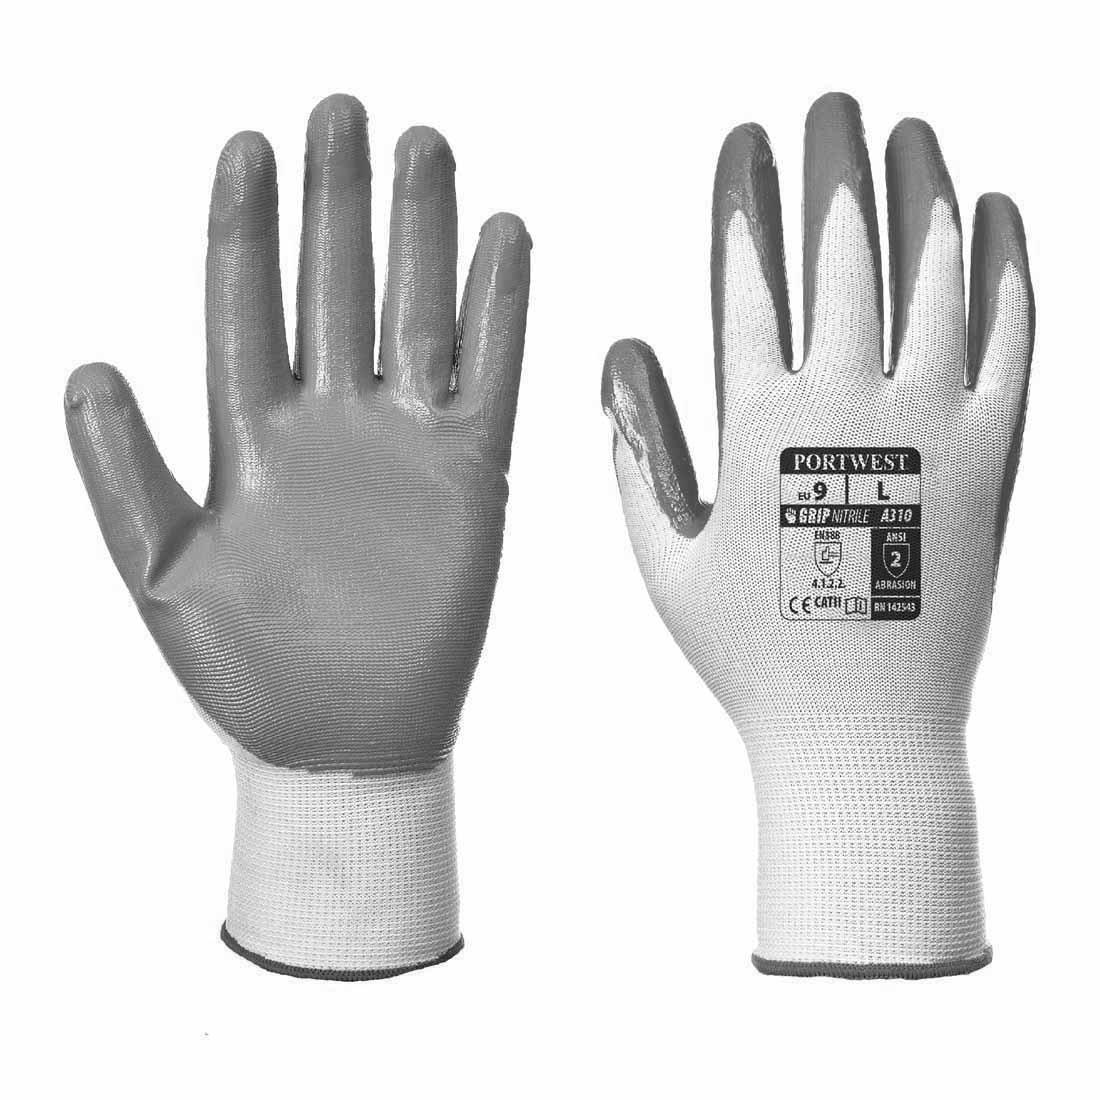 Flexo grip nitrile glove (A310)(Grey, XL) Portwest